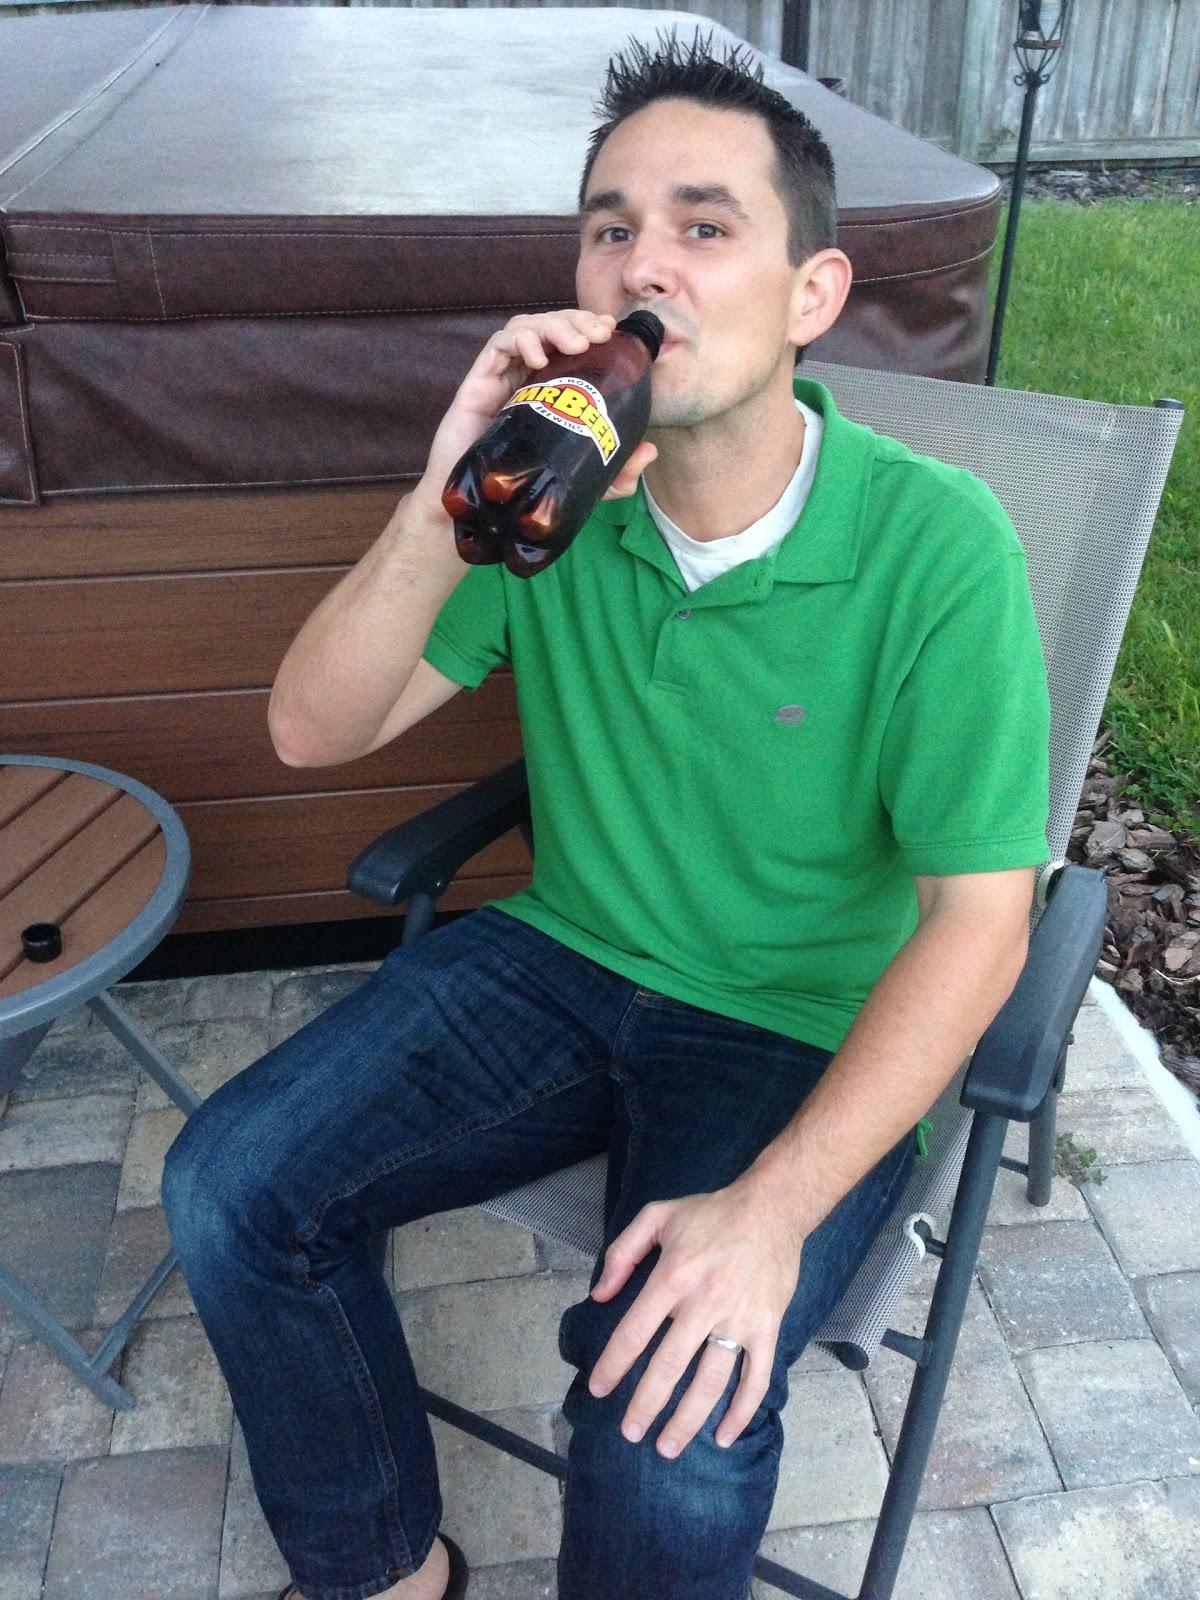 Enjoying Mr. Beer